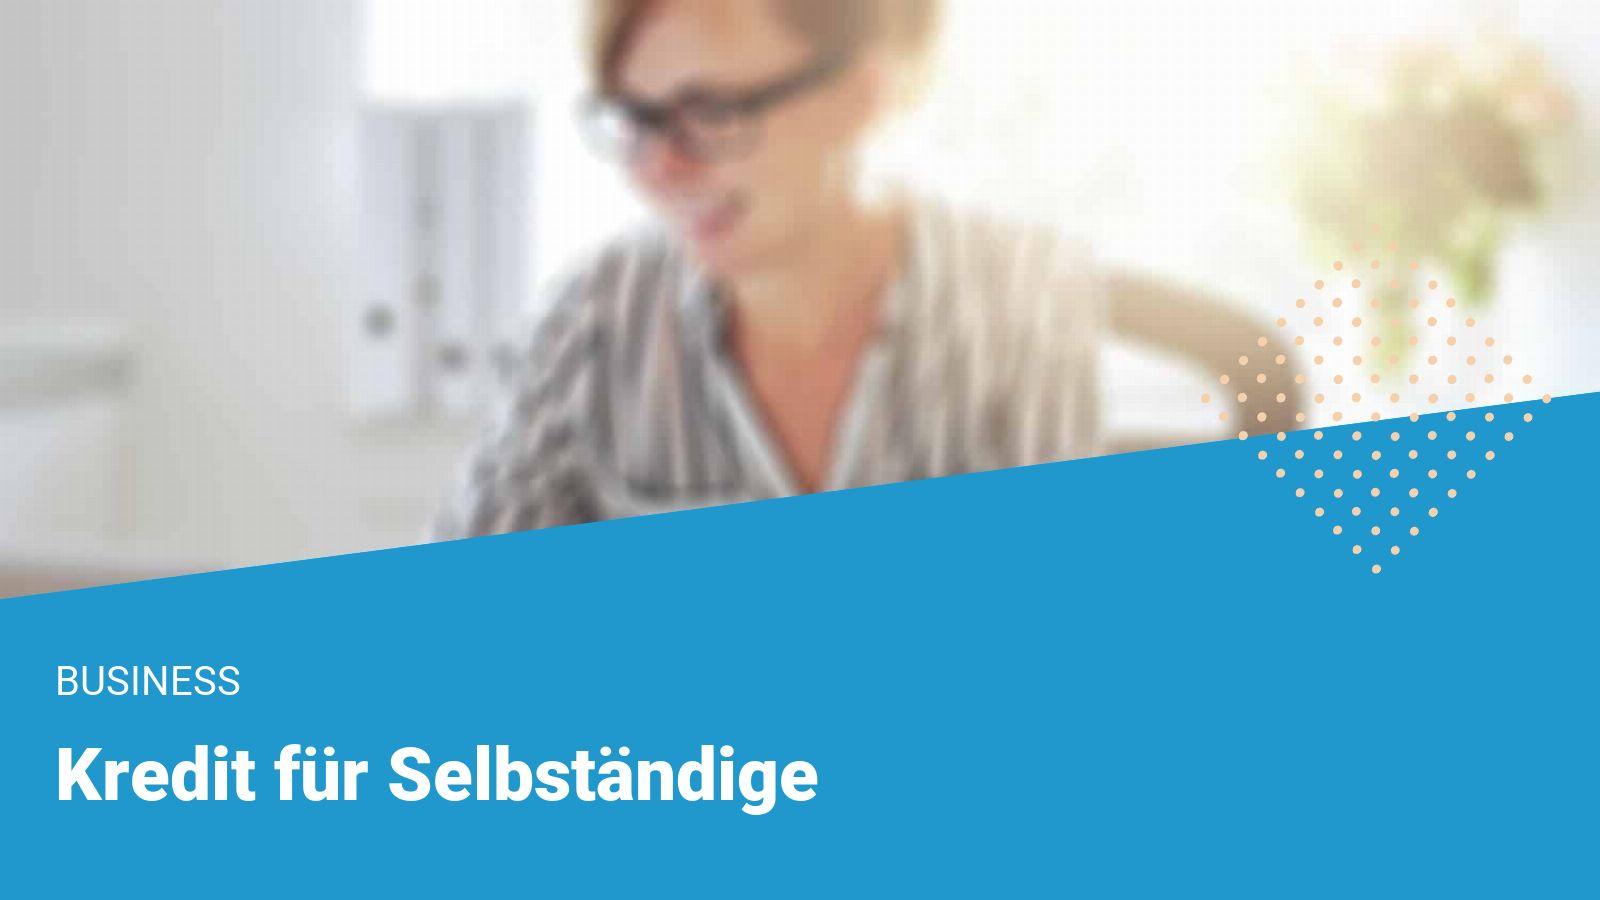 kredit-fuer-selbstaendige-min